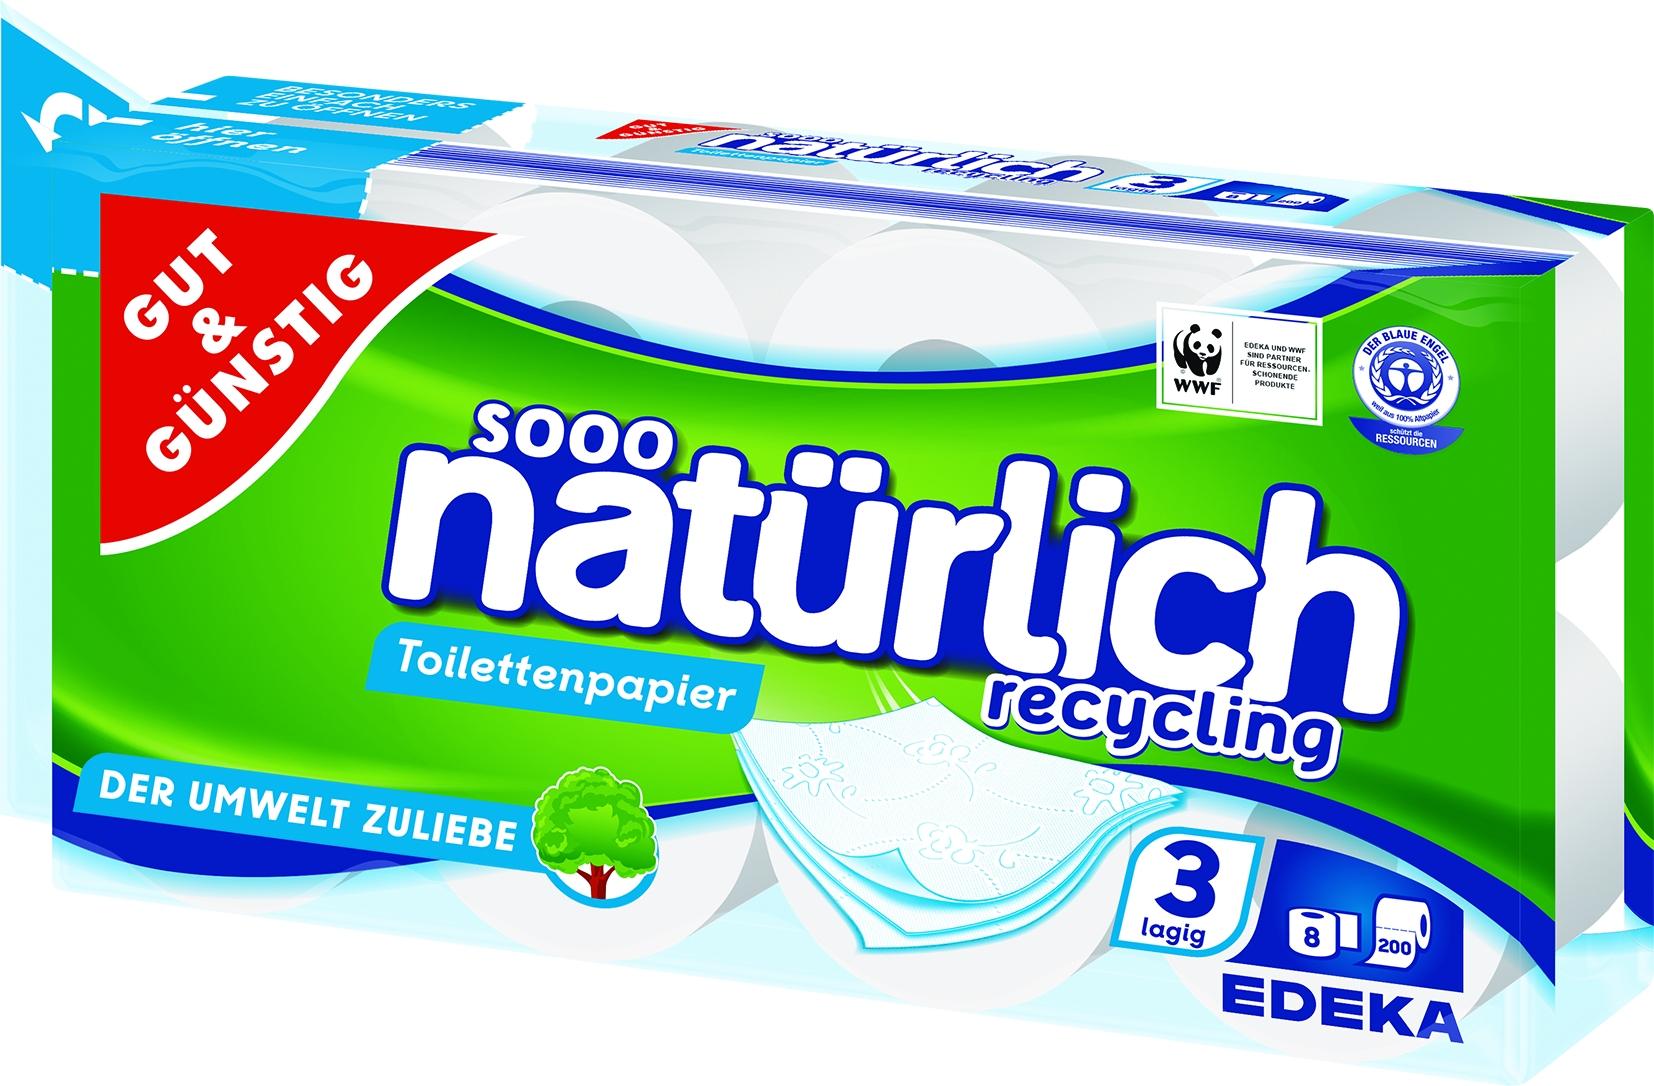 Toilettenpapier, 3-lag, Rec. 8x200Blatt